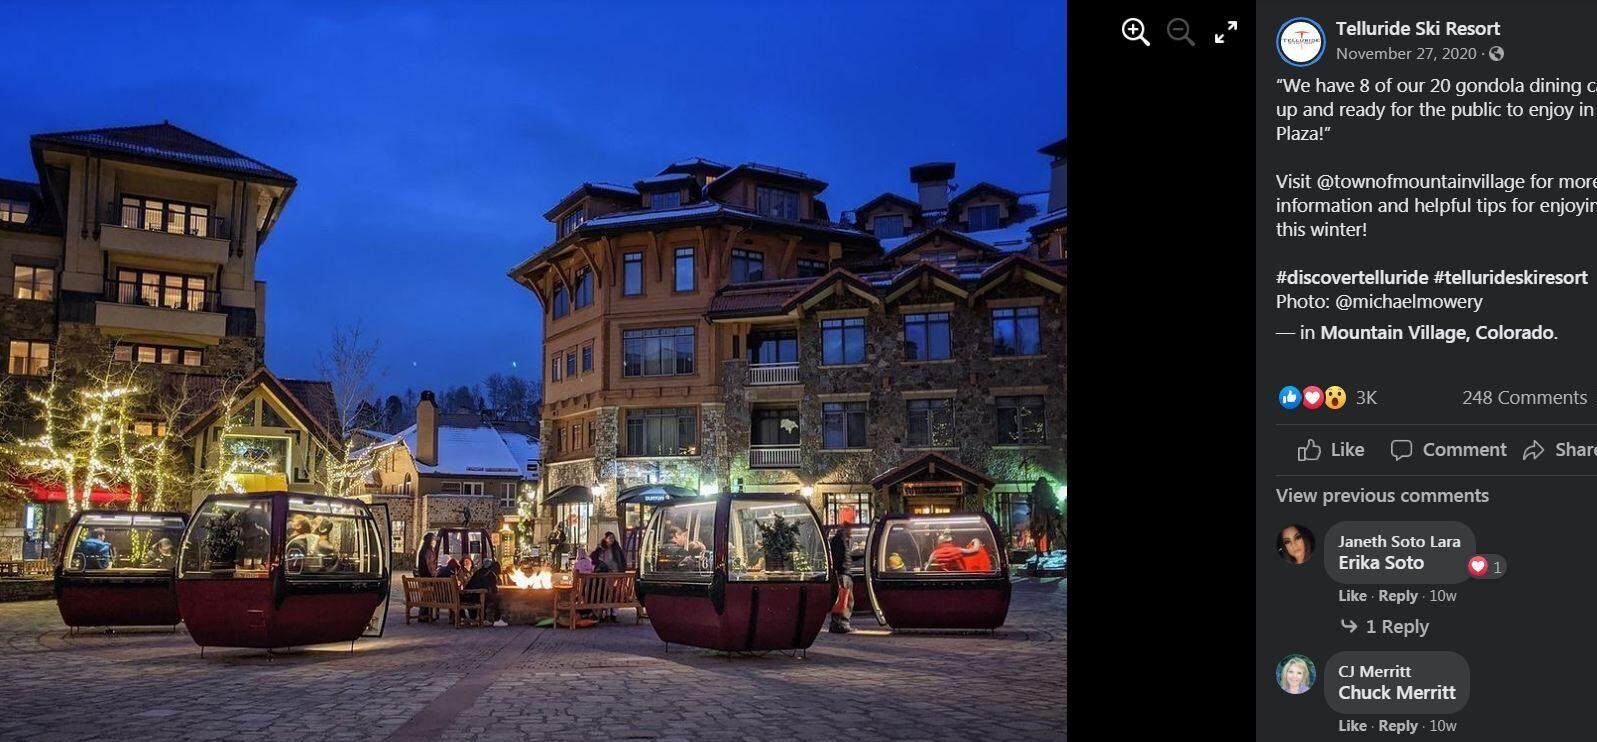 Ski Gondolas private dining